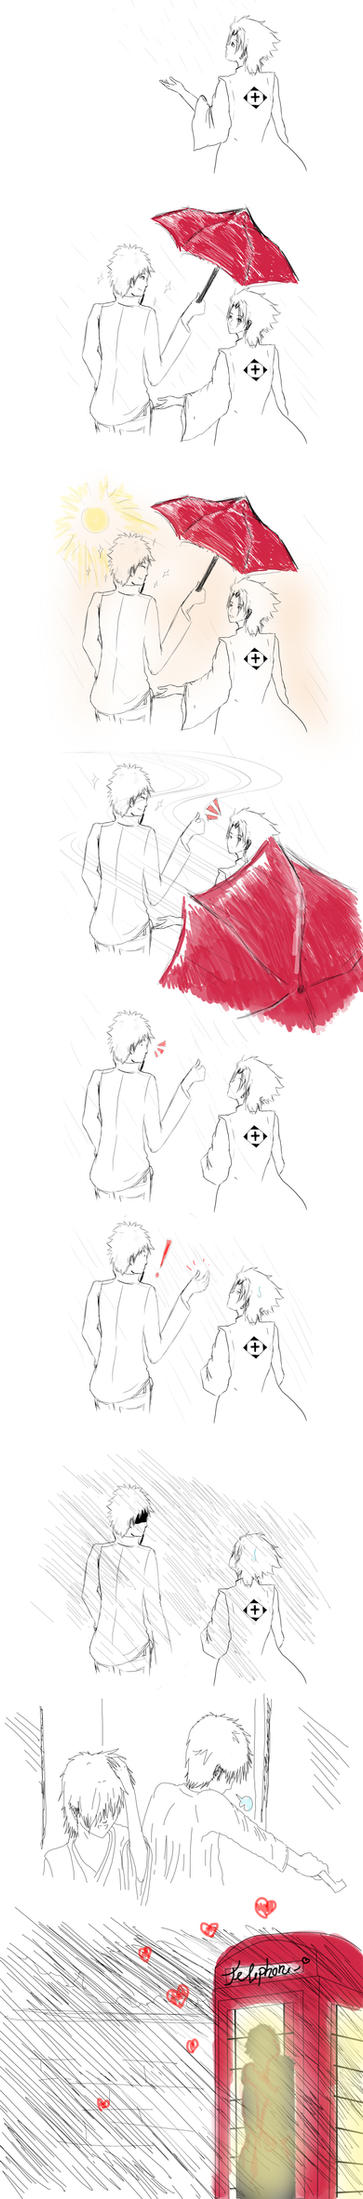 IchiHitsu - Umbrella by Miribirdy